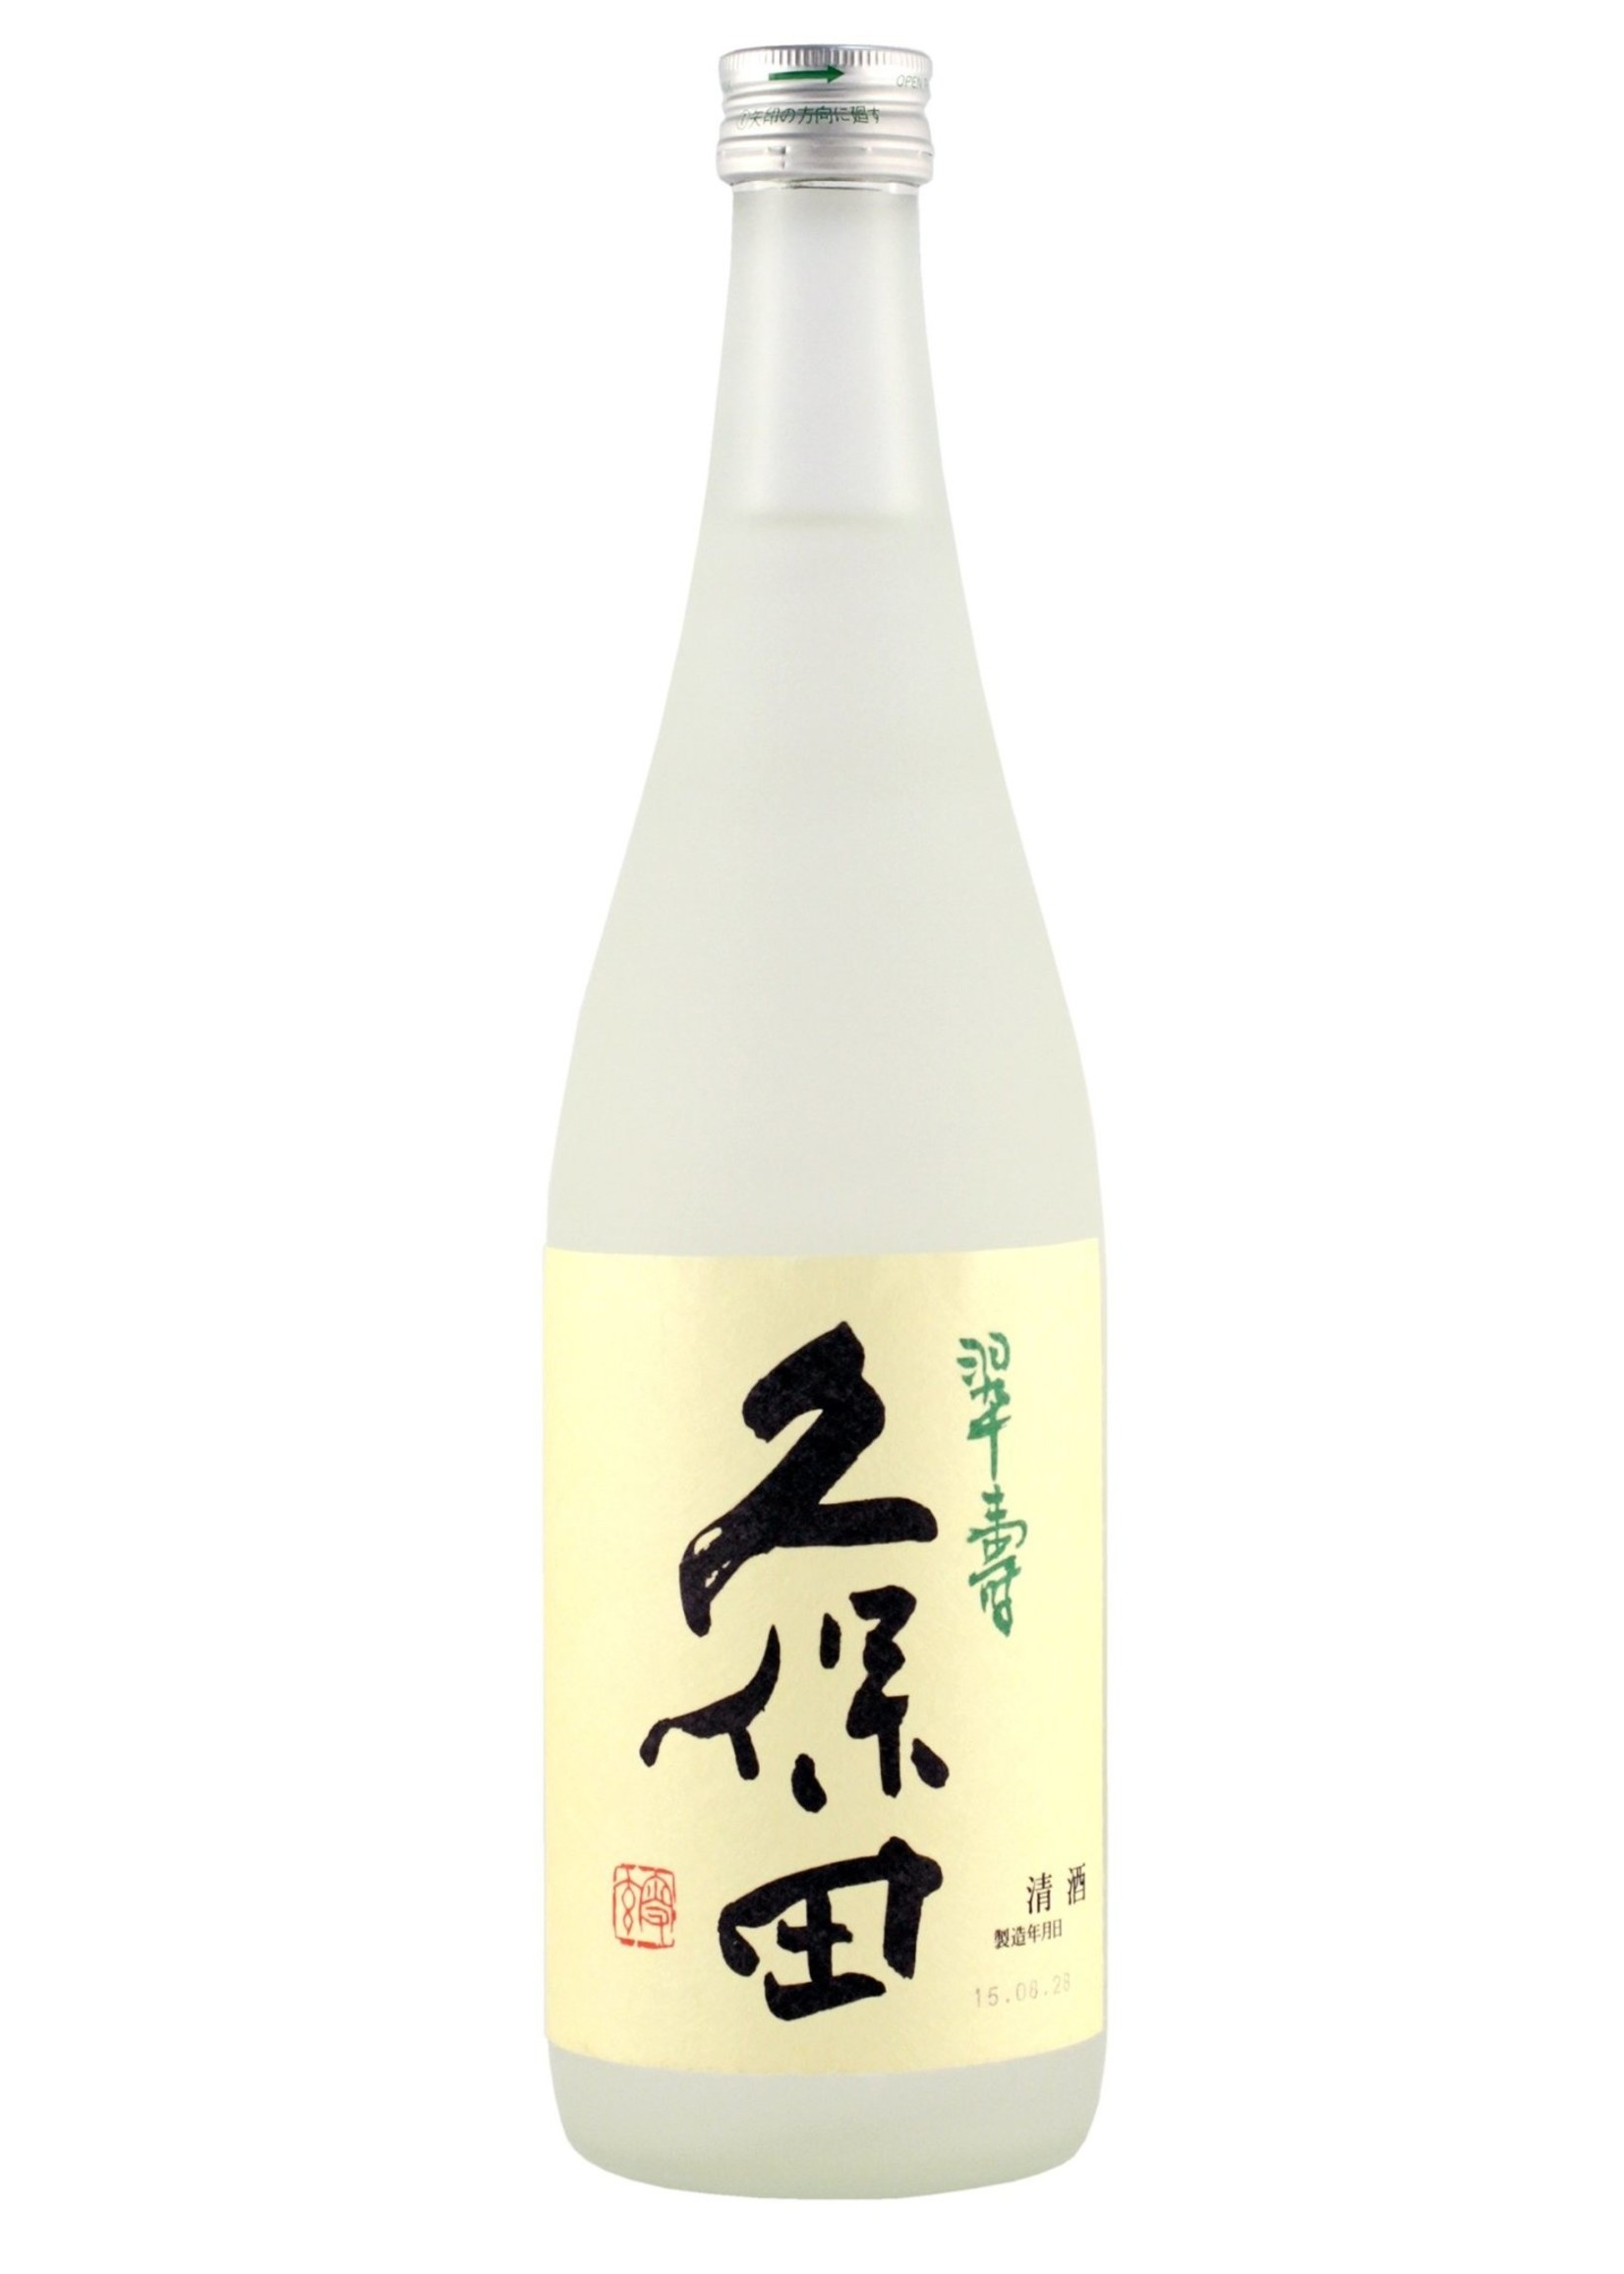 Asahi Shuzo (Niigata) Asahi Shuzo (Niigata) Kubota / Suiju Daiginjo / 720mL